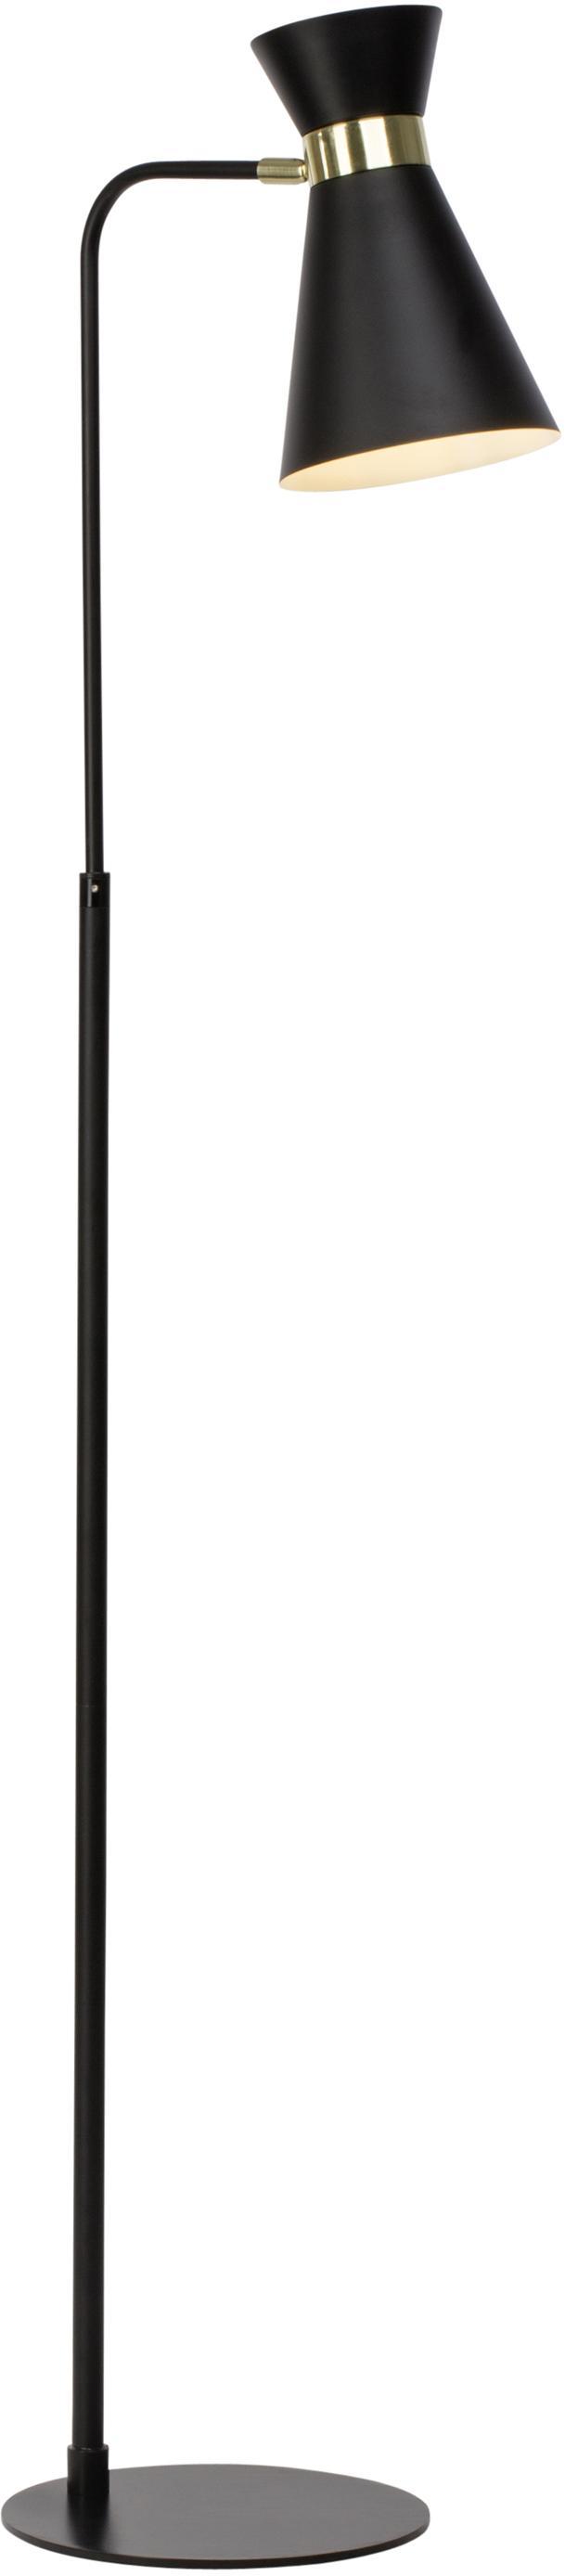 Retro-Leselampe Grazia aus Metall, Lampenschirm: Metall, lackiert, Lampenfuß: Metall, lackiert, Dekor: Metall, vermessingt, Lampenfuß und Lampenschirm: Schwarz<br>Befestigung: Goldfarben, matt, 39 x 144 cm